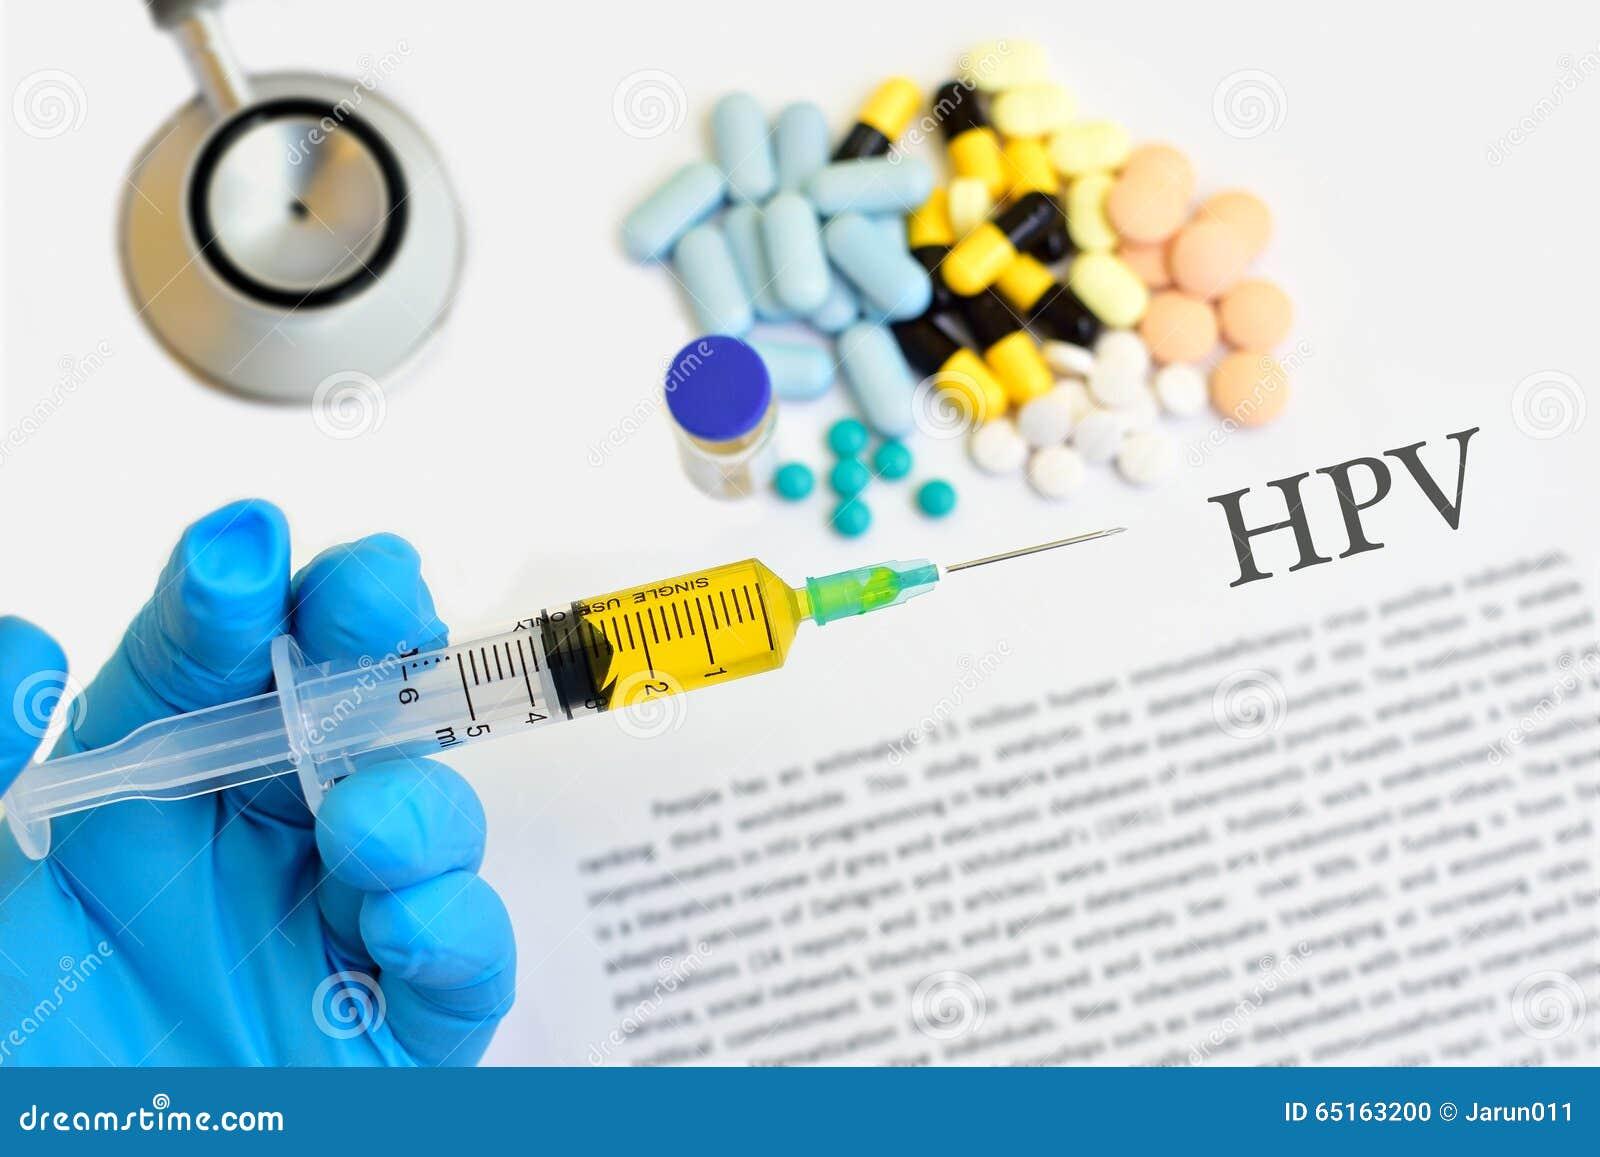 hpv virus medscape simptome de paraziti la copii